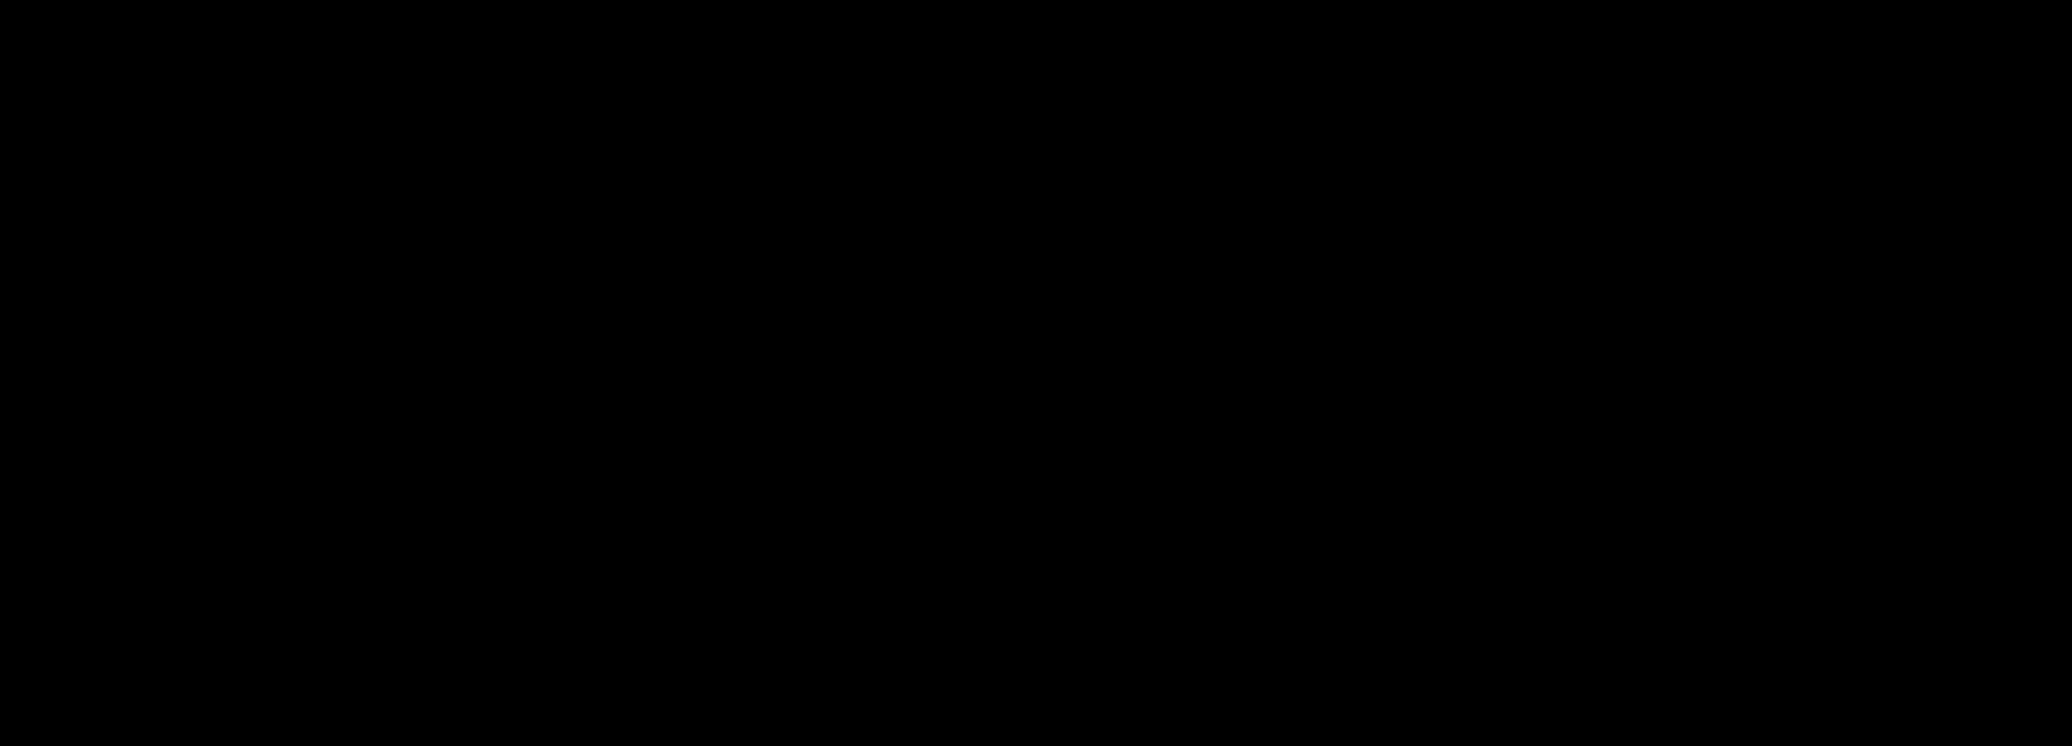 tert-Butyl 6-(7-hydroxycoumarin-4-acetamido)hexyl carbamate